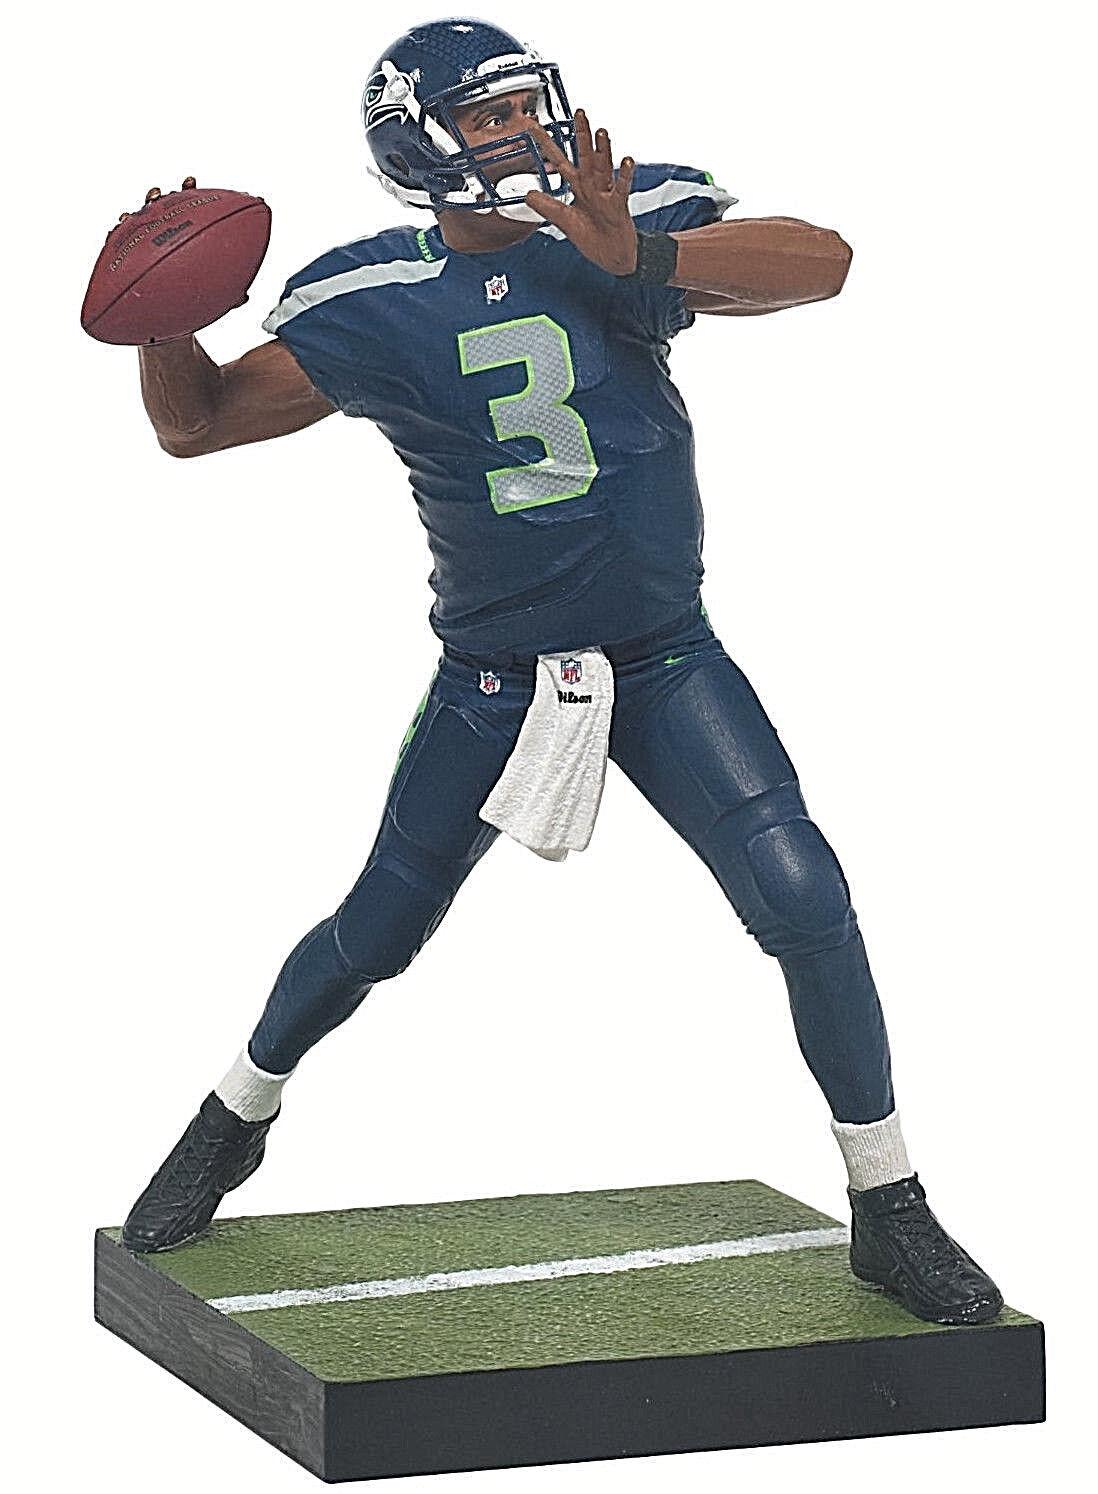 McFARLANE NFL Series _Russell WILSON 6 inch Debut action figure_MIP_Seahawks